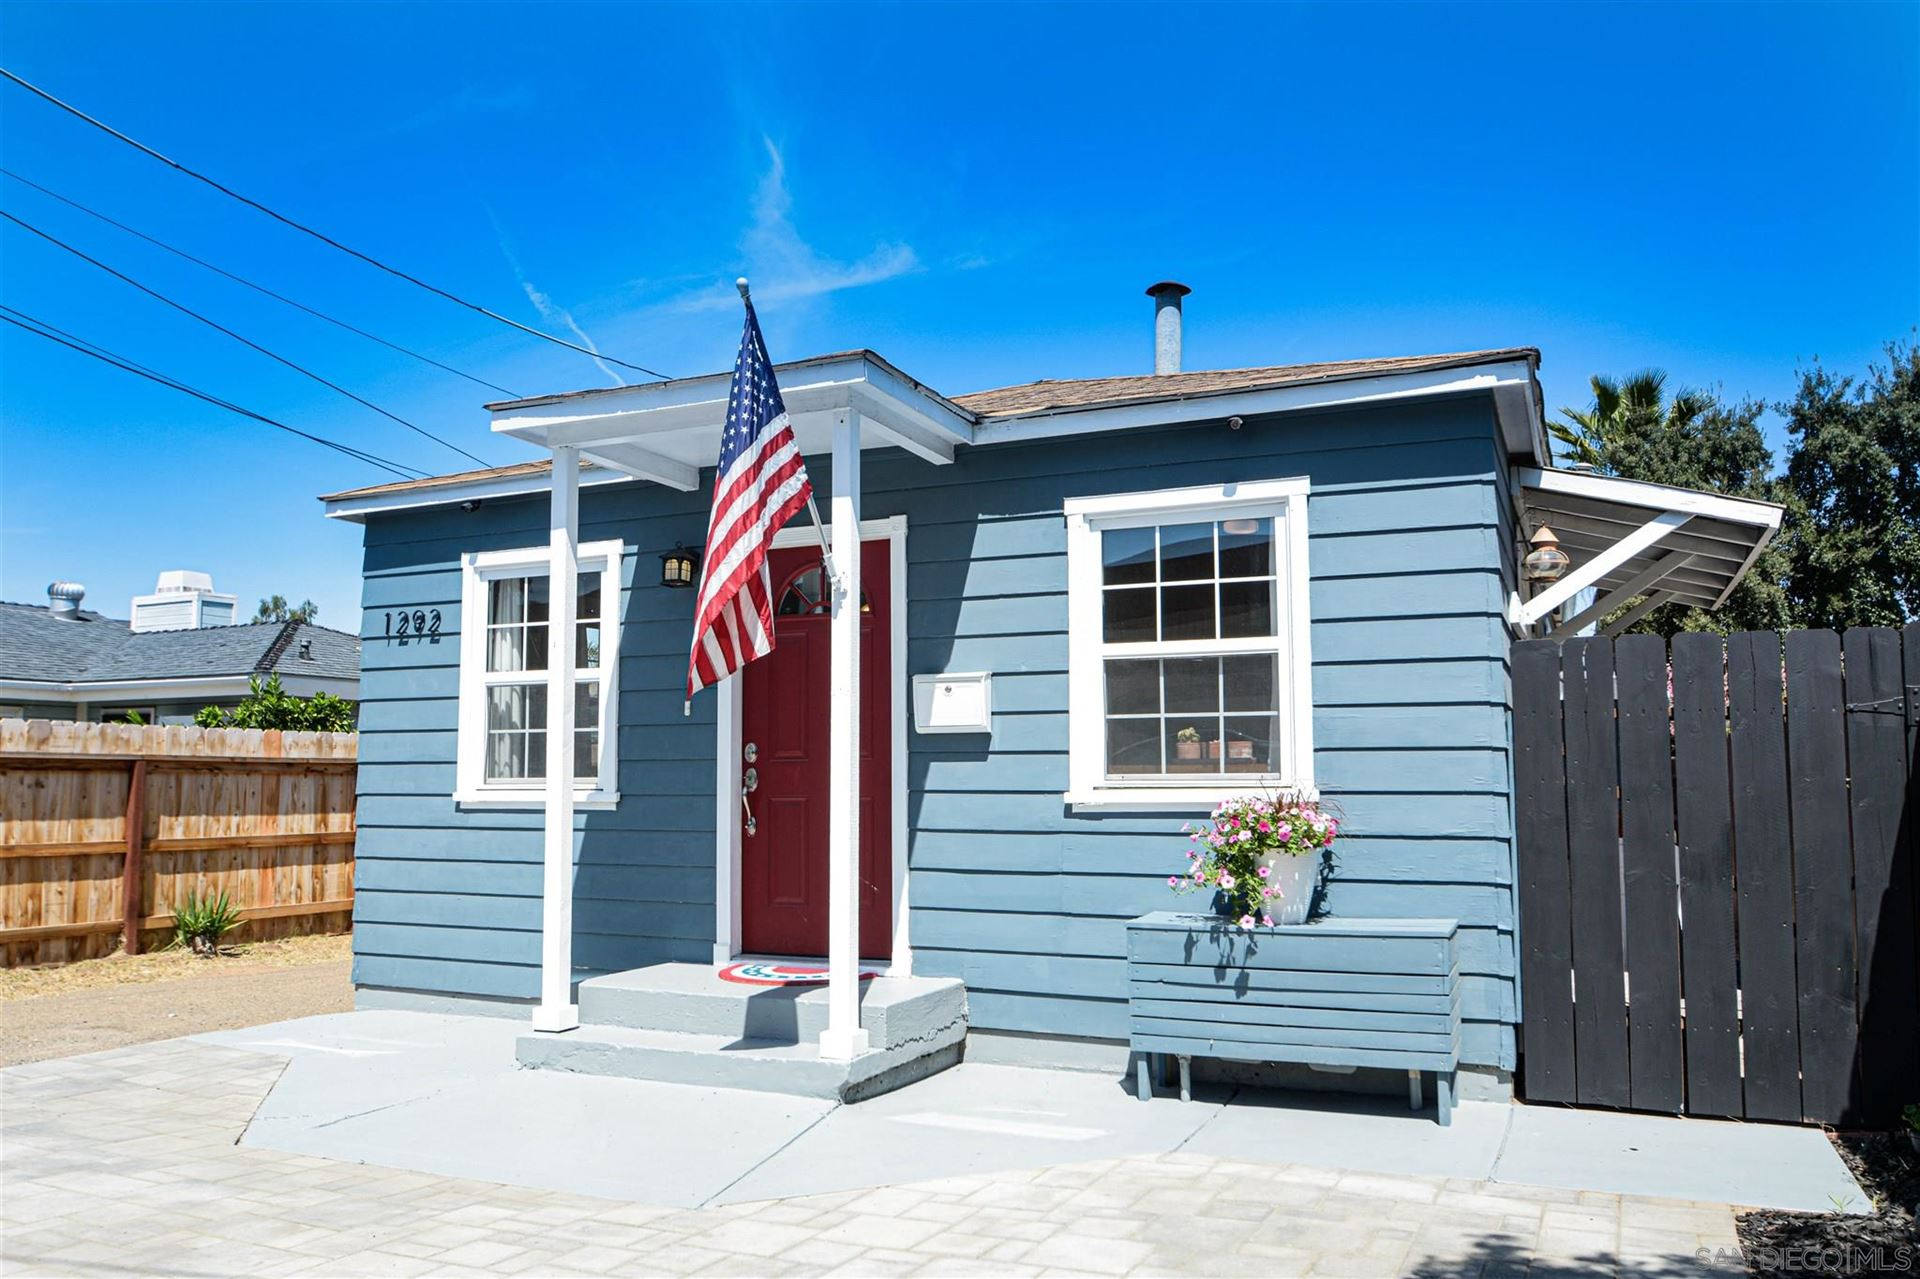 Photo of 1292 Naranca Ave, El Cajon, CA 92021 (MLS # 210009075)